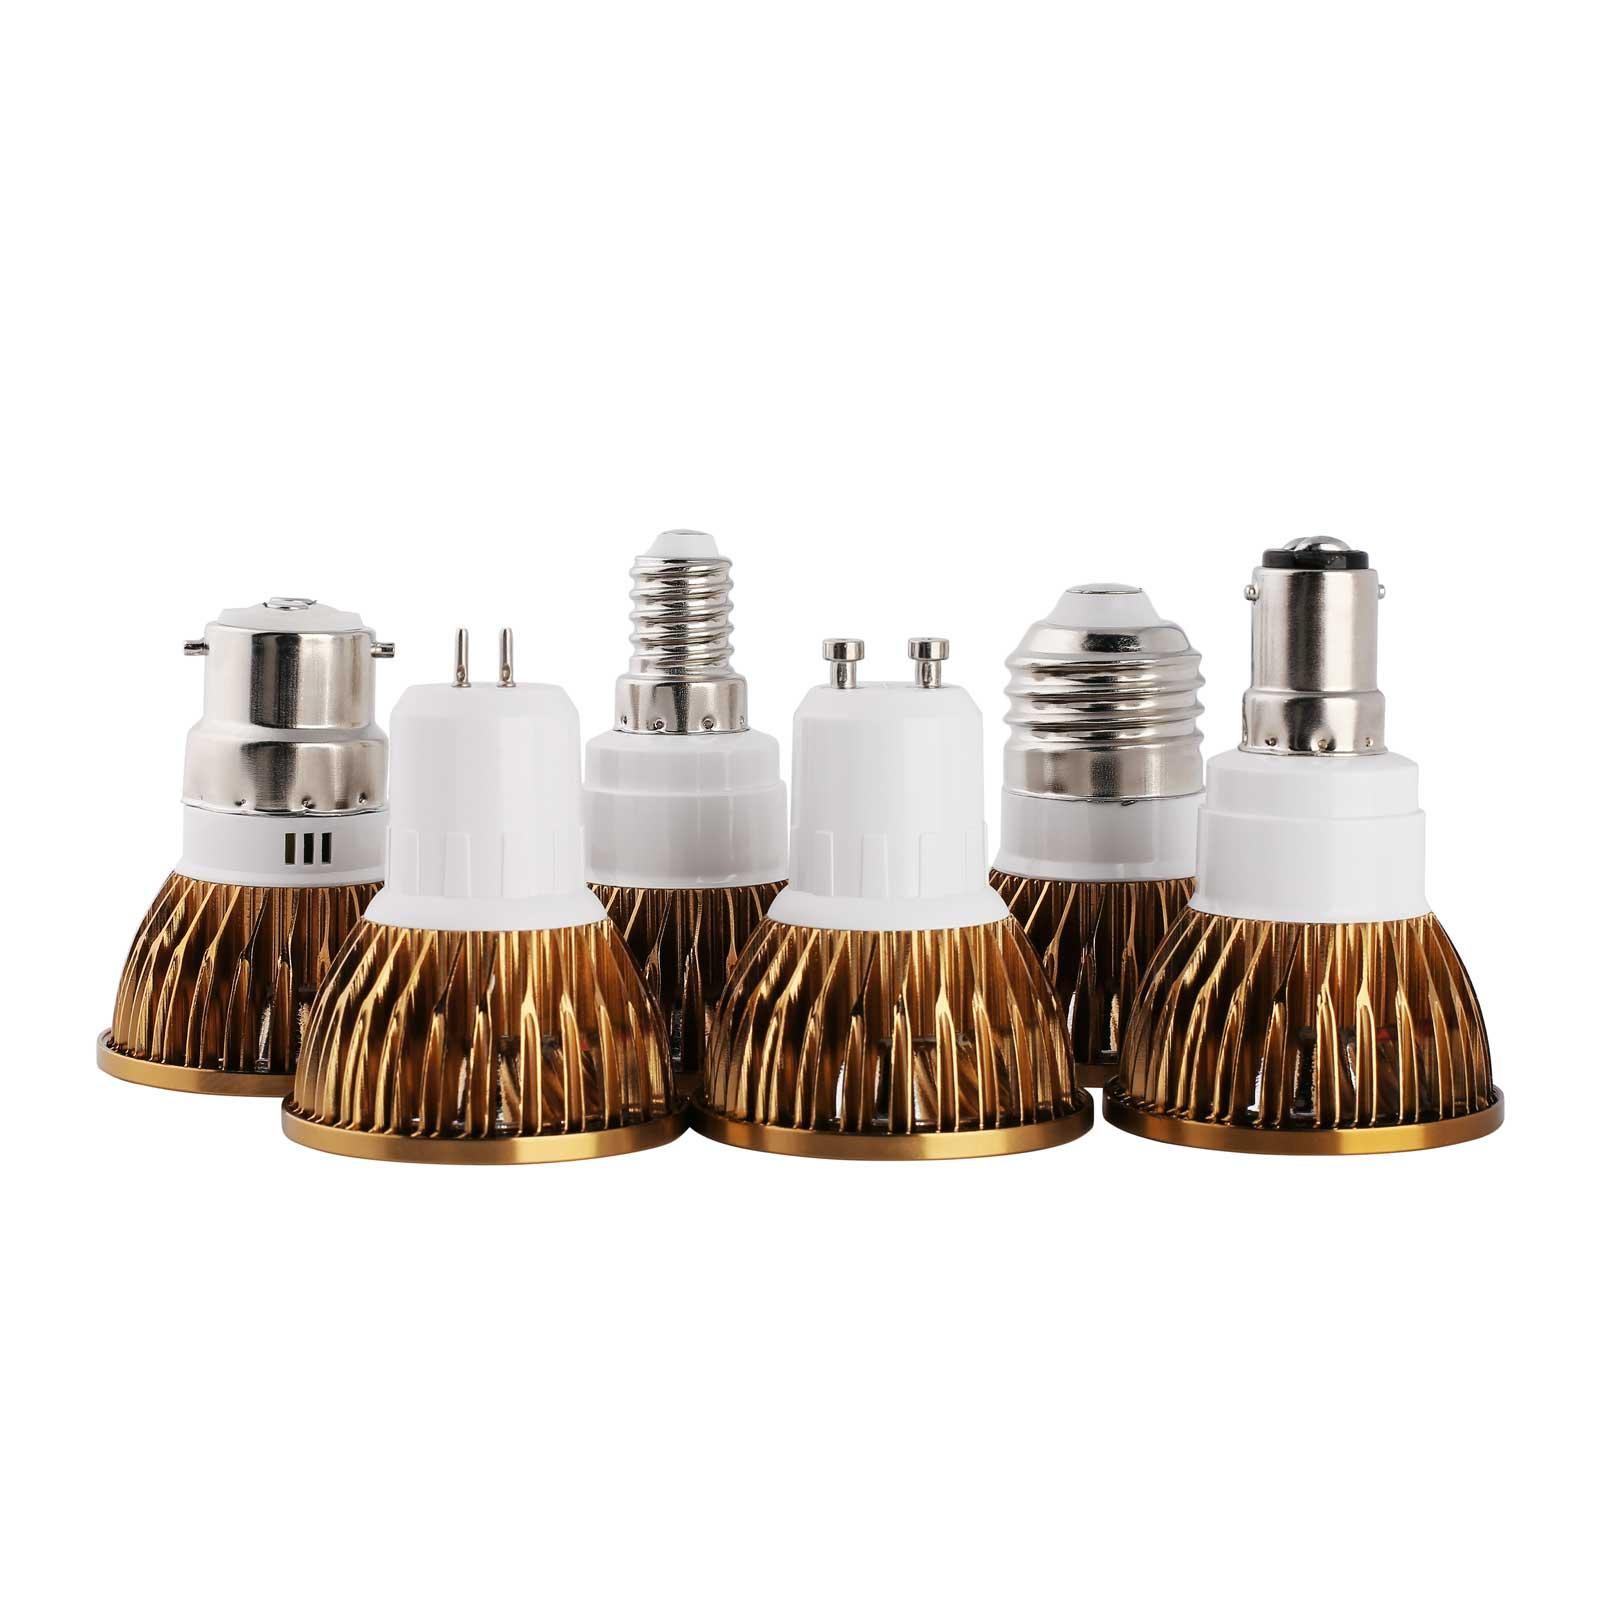 Dimmable Led Cob Spotlight E26 E27 Gu10 Gu5 3 Mr16 6w 9w: Dimmable LED COB Spot Lights Bulbs GU10/MR16/GU5.3/E27/E14